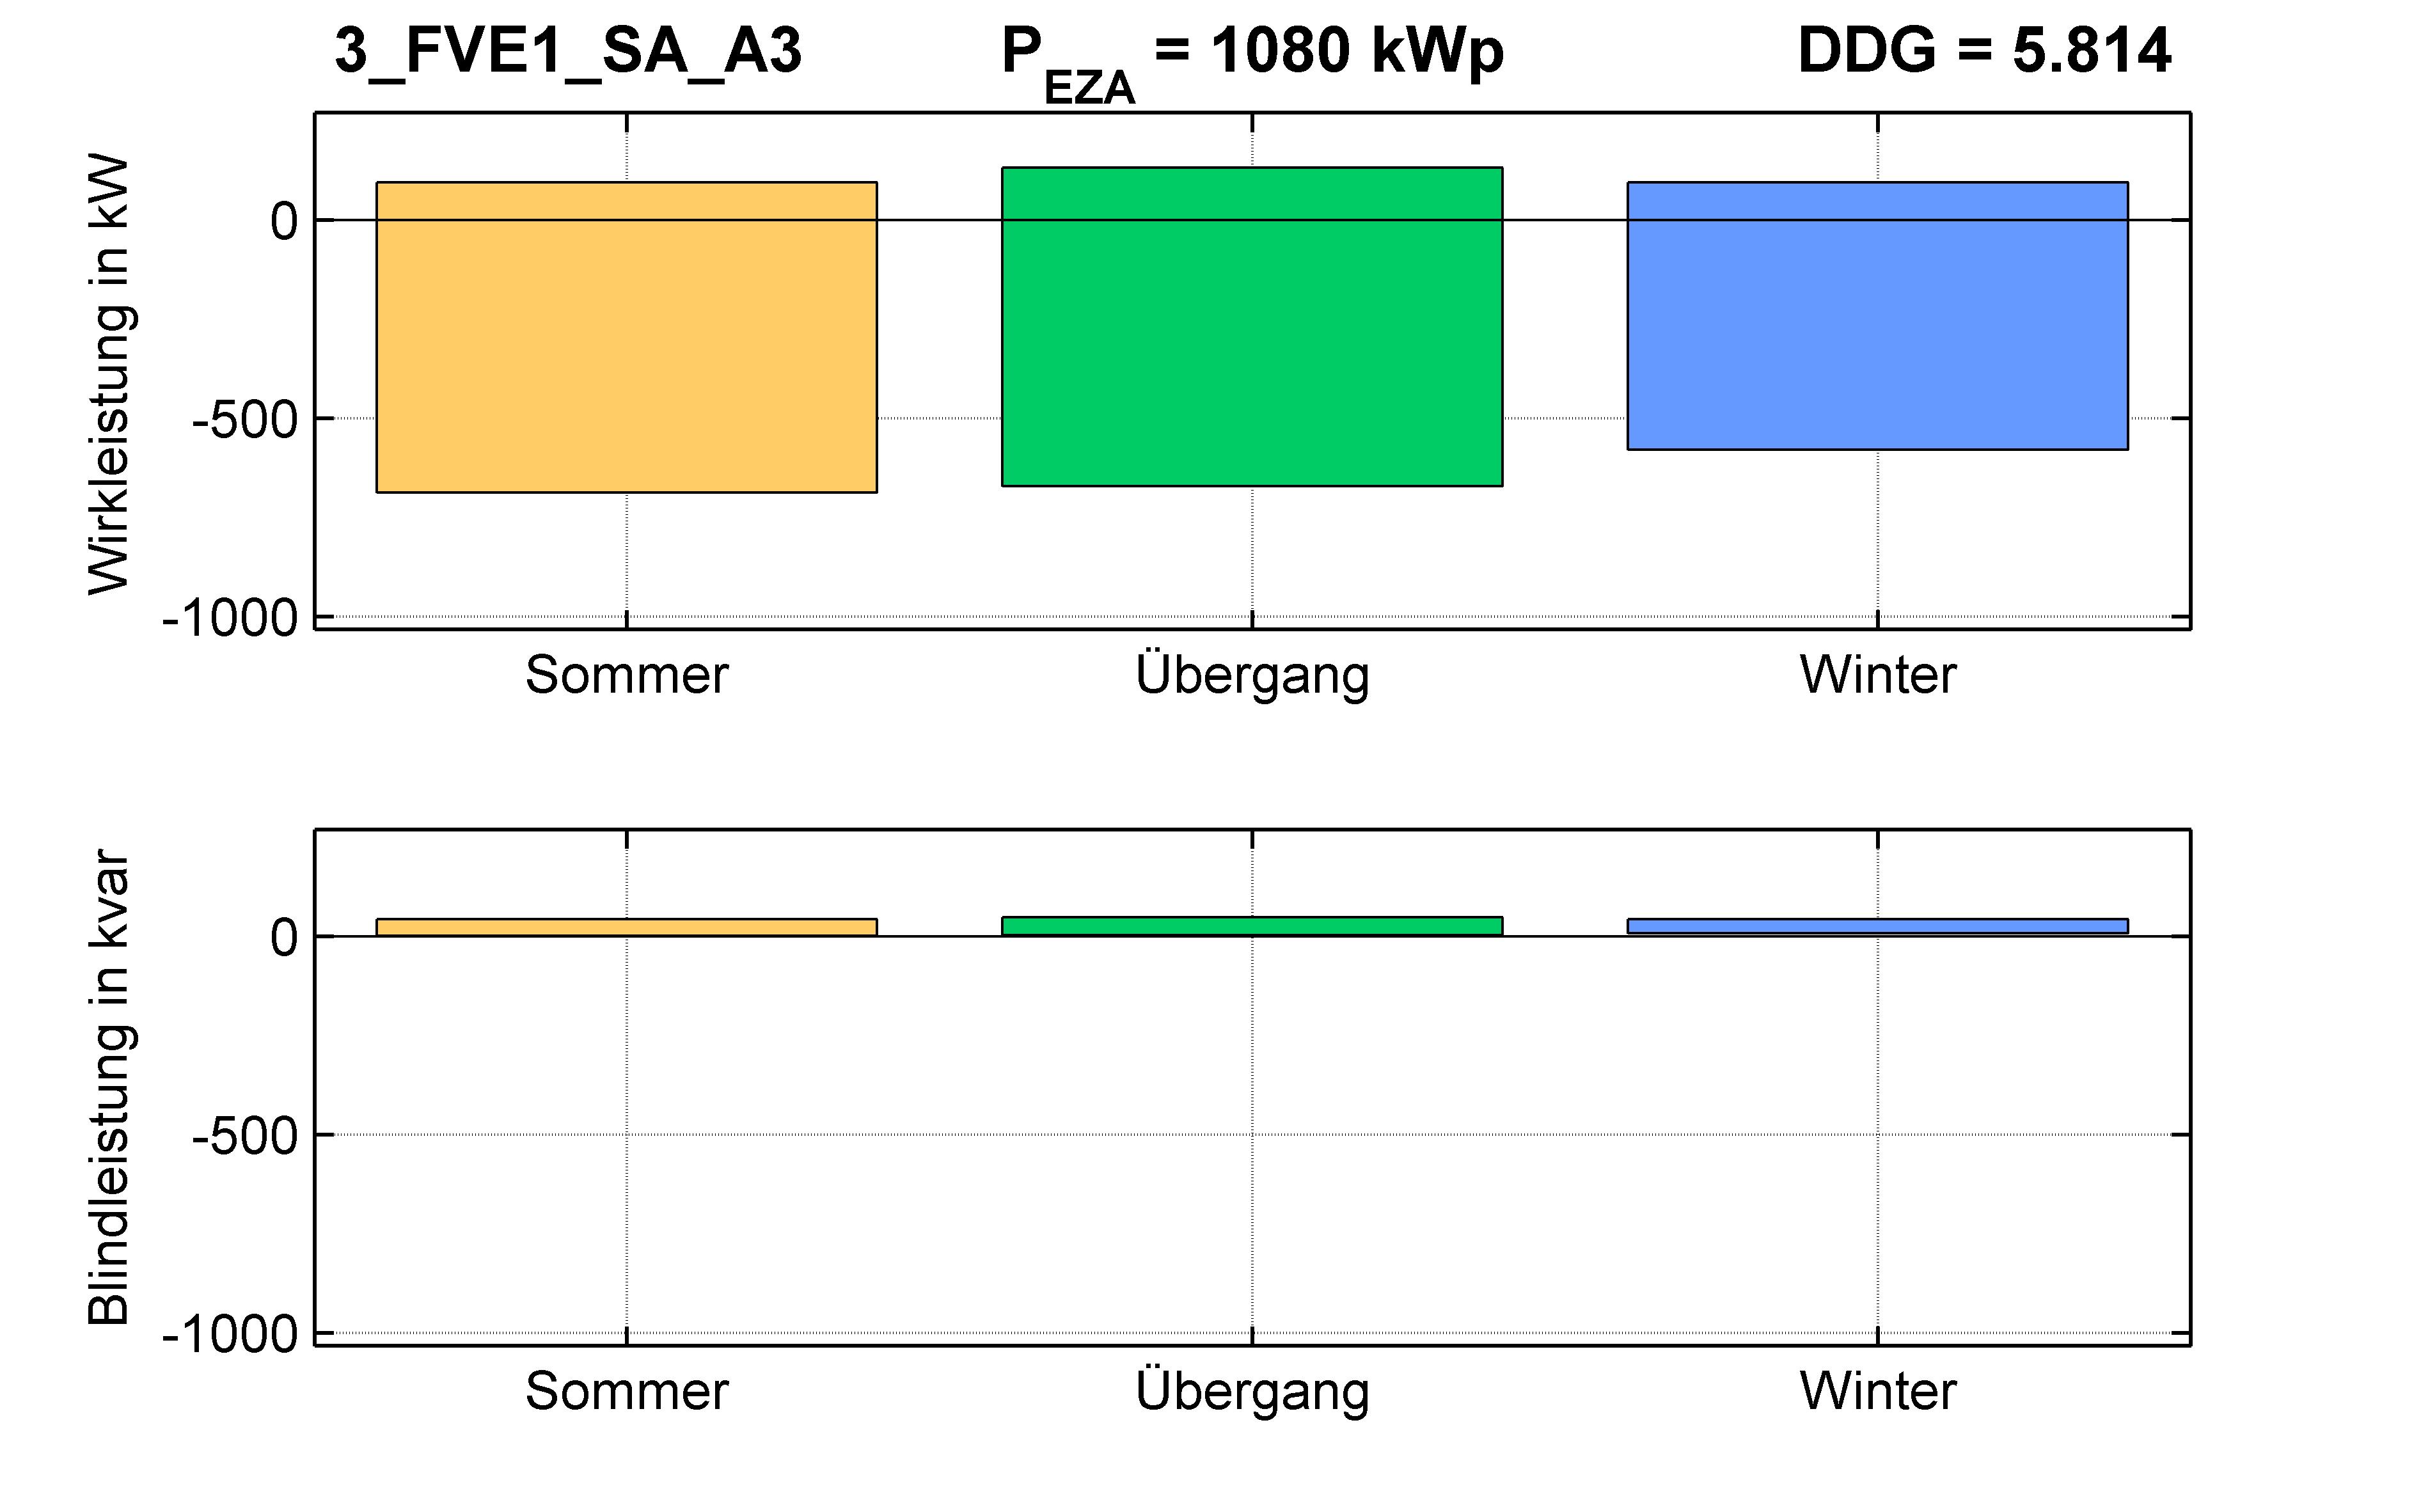 FVE1 | P-Kappung 70% (SA) A3 | PQ-Bilanz